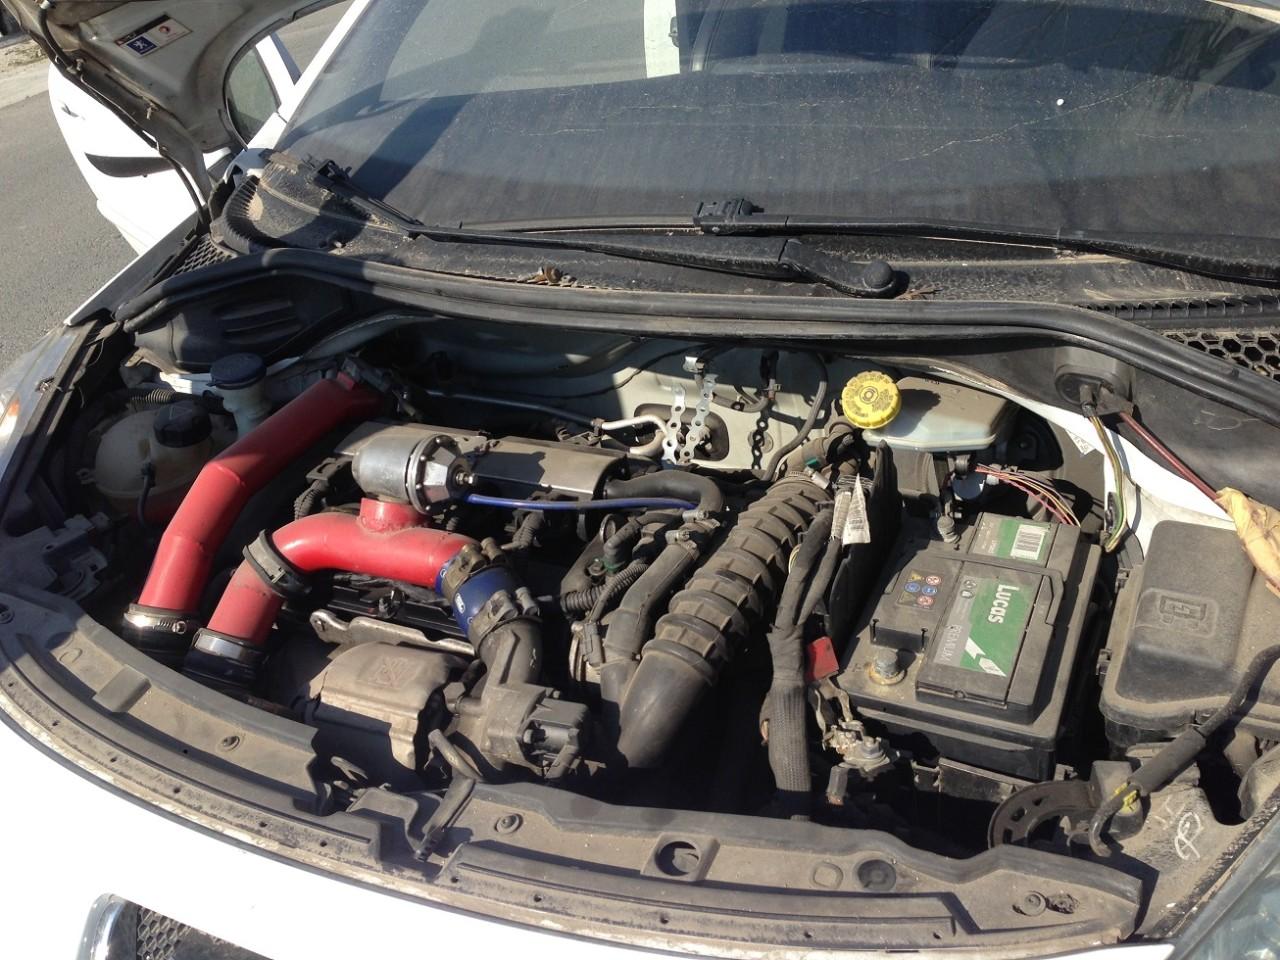 piese peugeot 207 rc gti 1600 benzina turbo an 2008 cutie manuala interior recaro